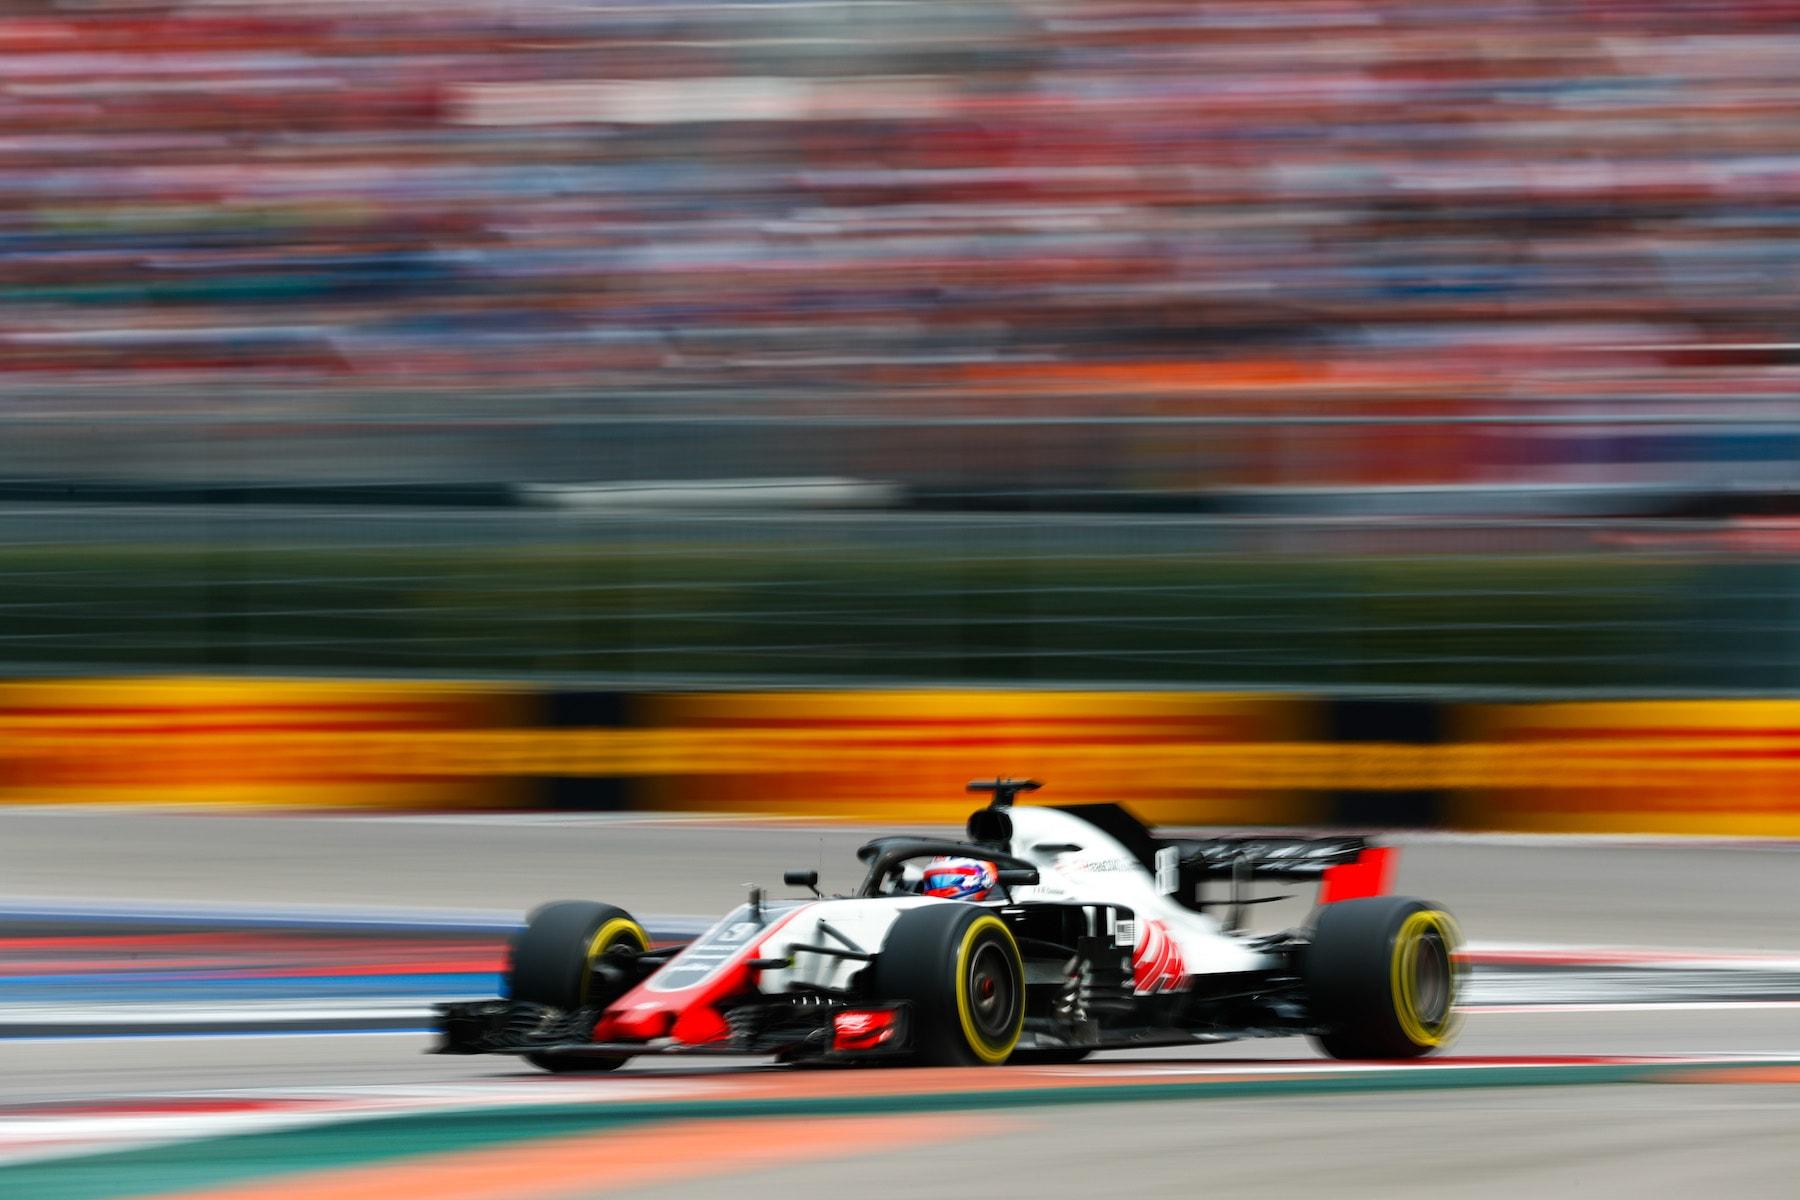 F 2018 Romain Grosjean | Haas VF18 | 2018 Russian GP 3 copy.jpg